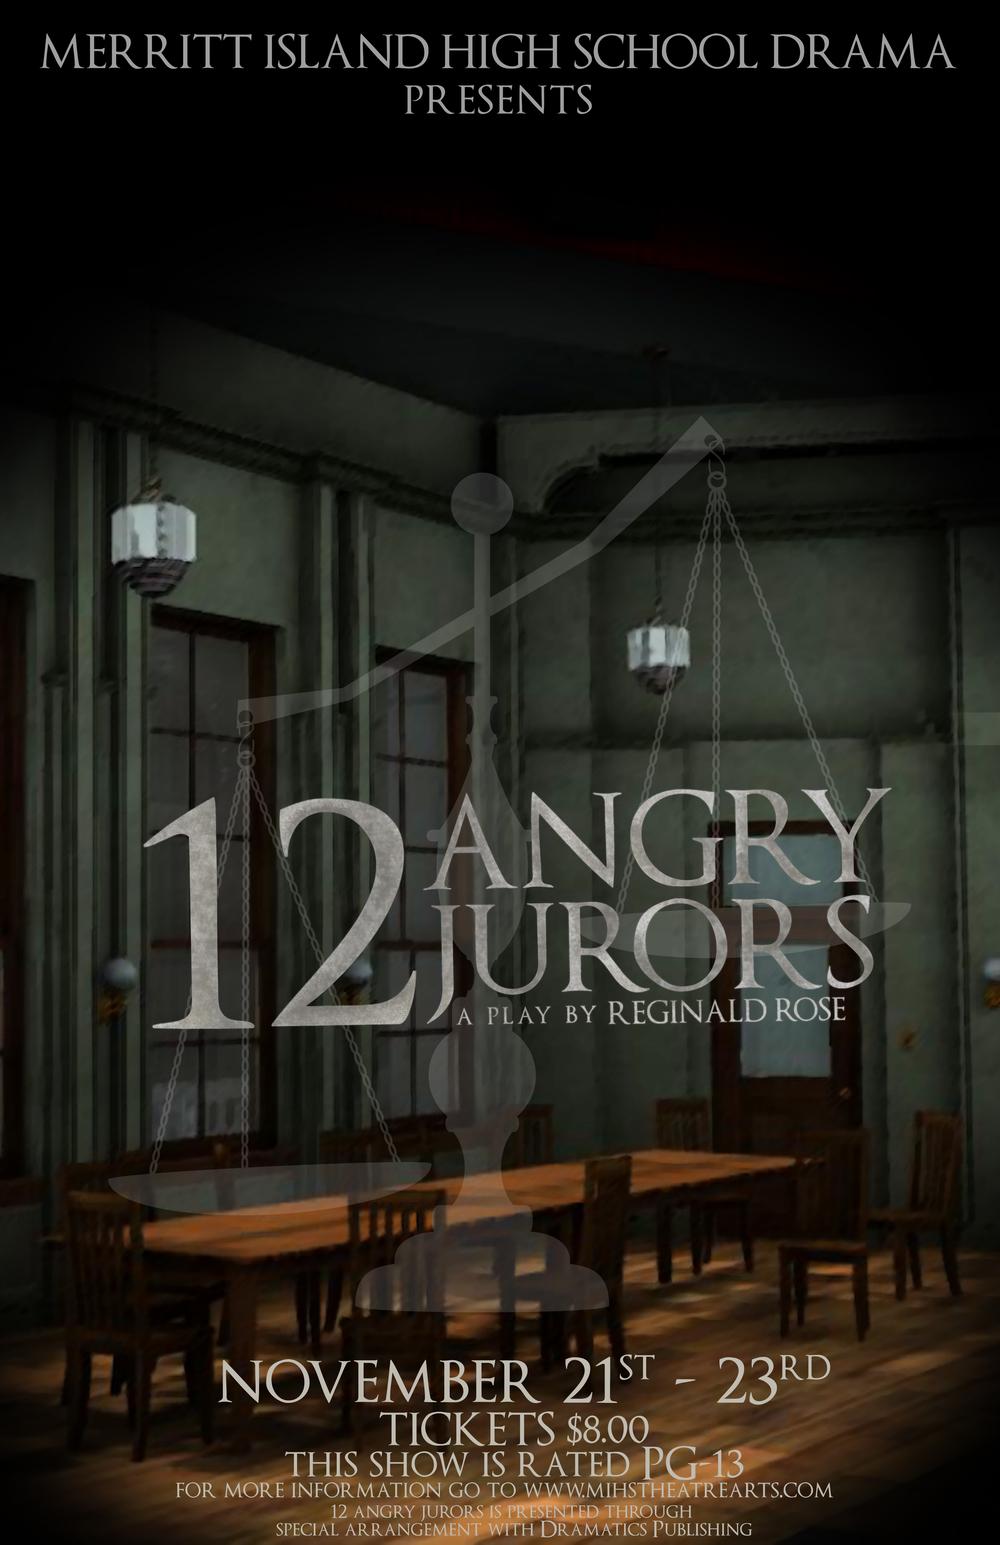 12 Angry Men Poster 1.jpg